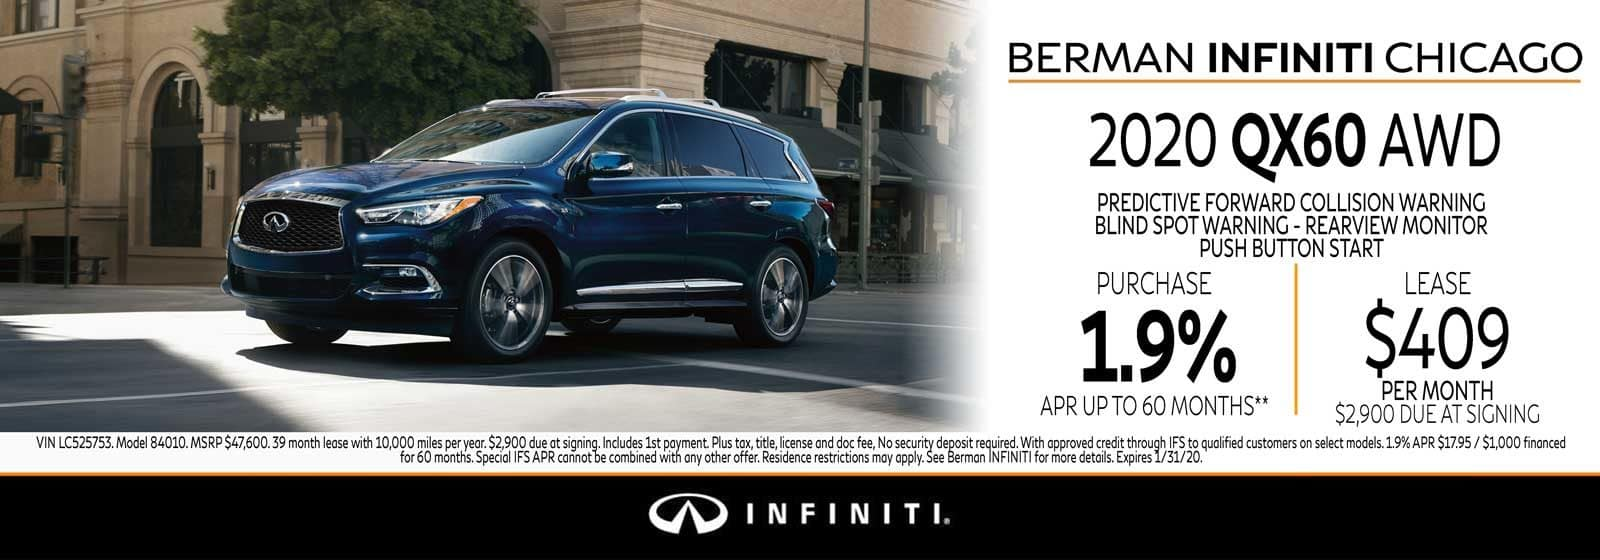 New 2020 INFINITI QX60 January offer at Berman INFINITI Chicago!